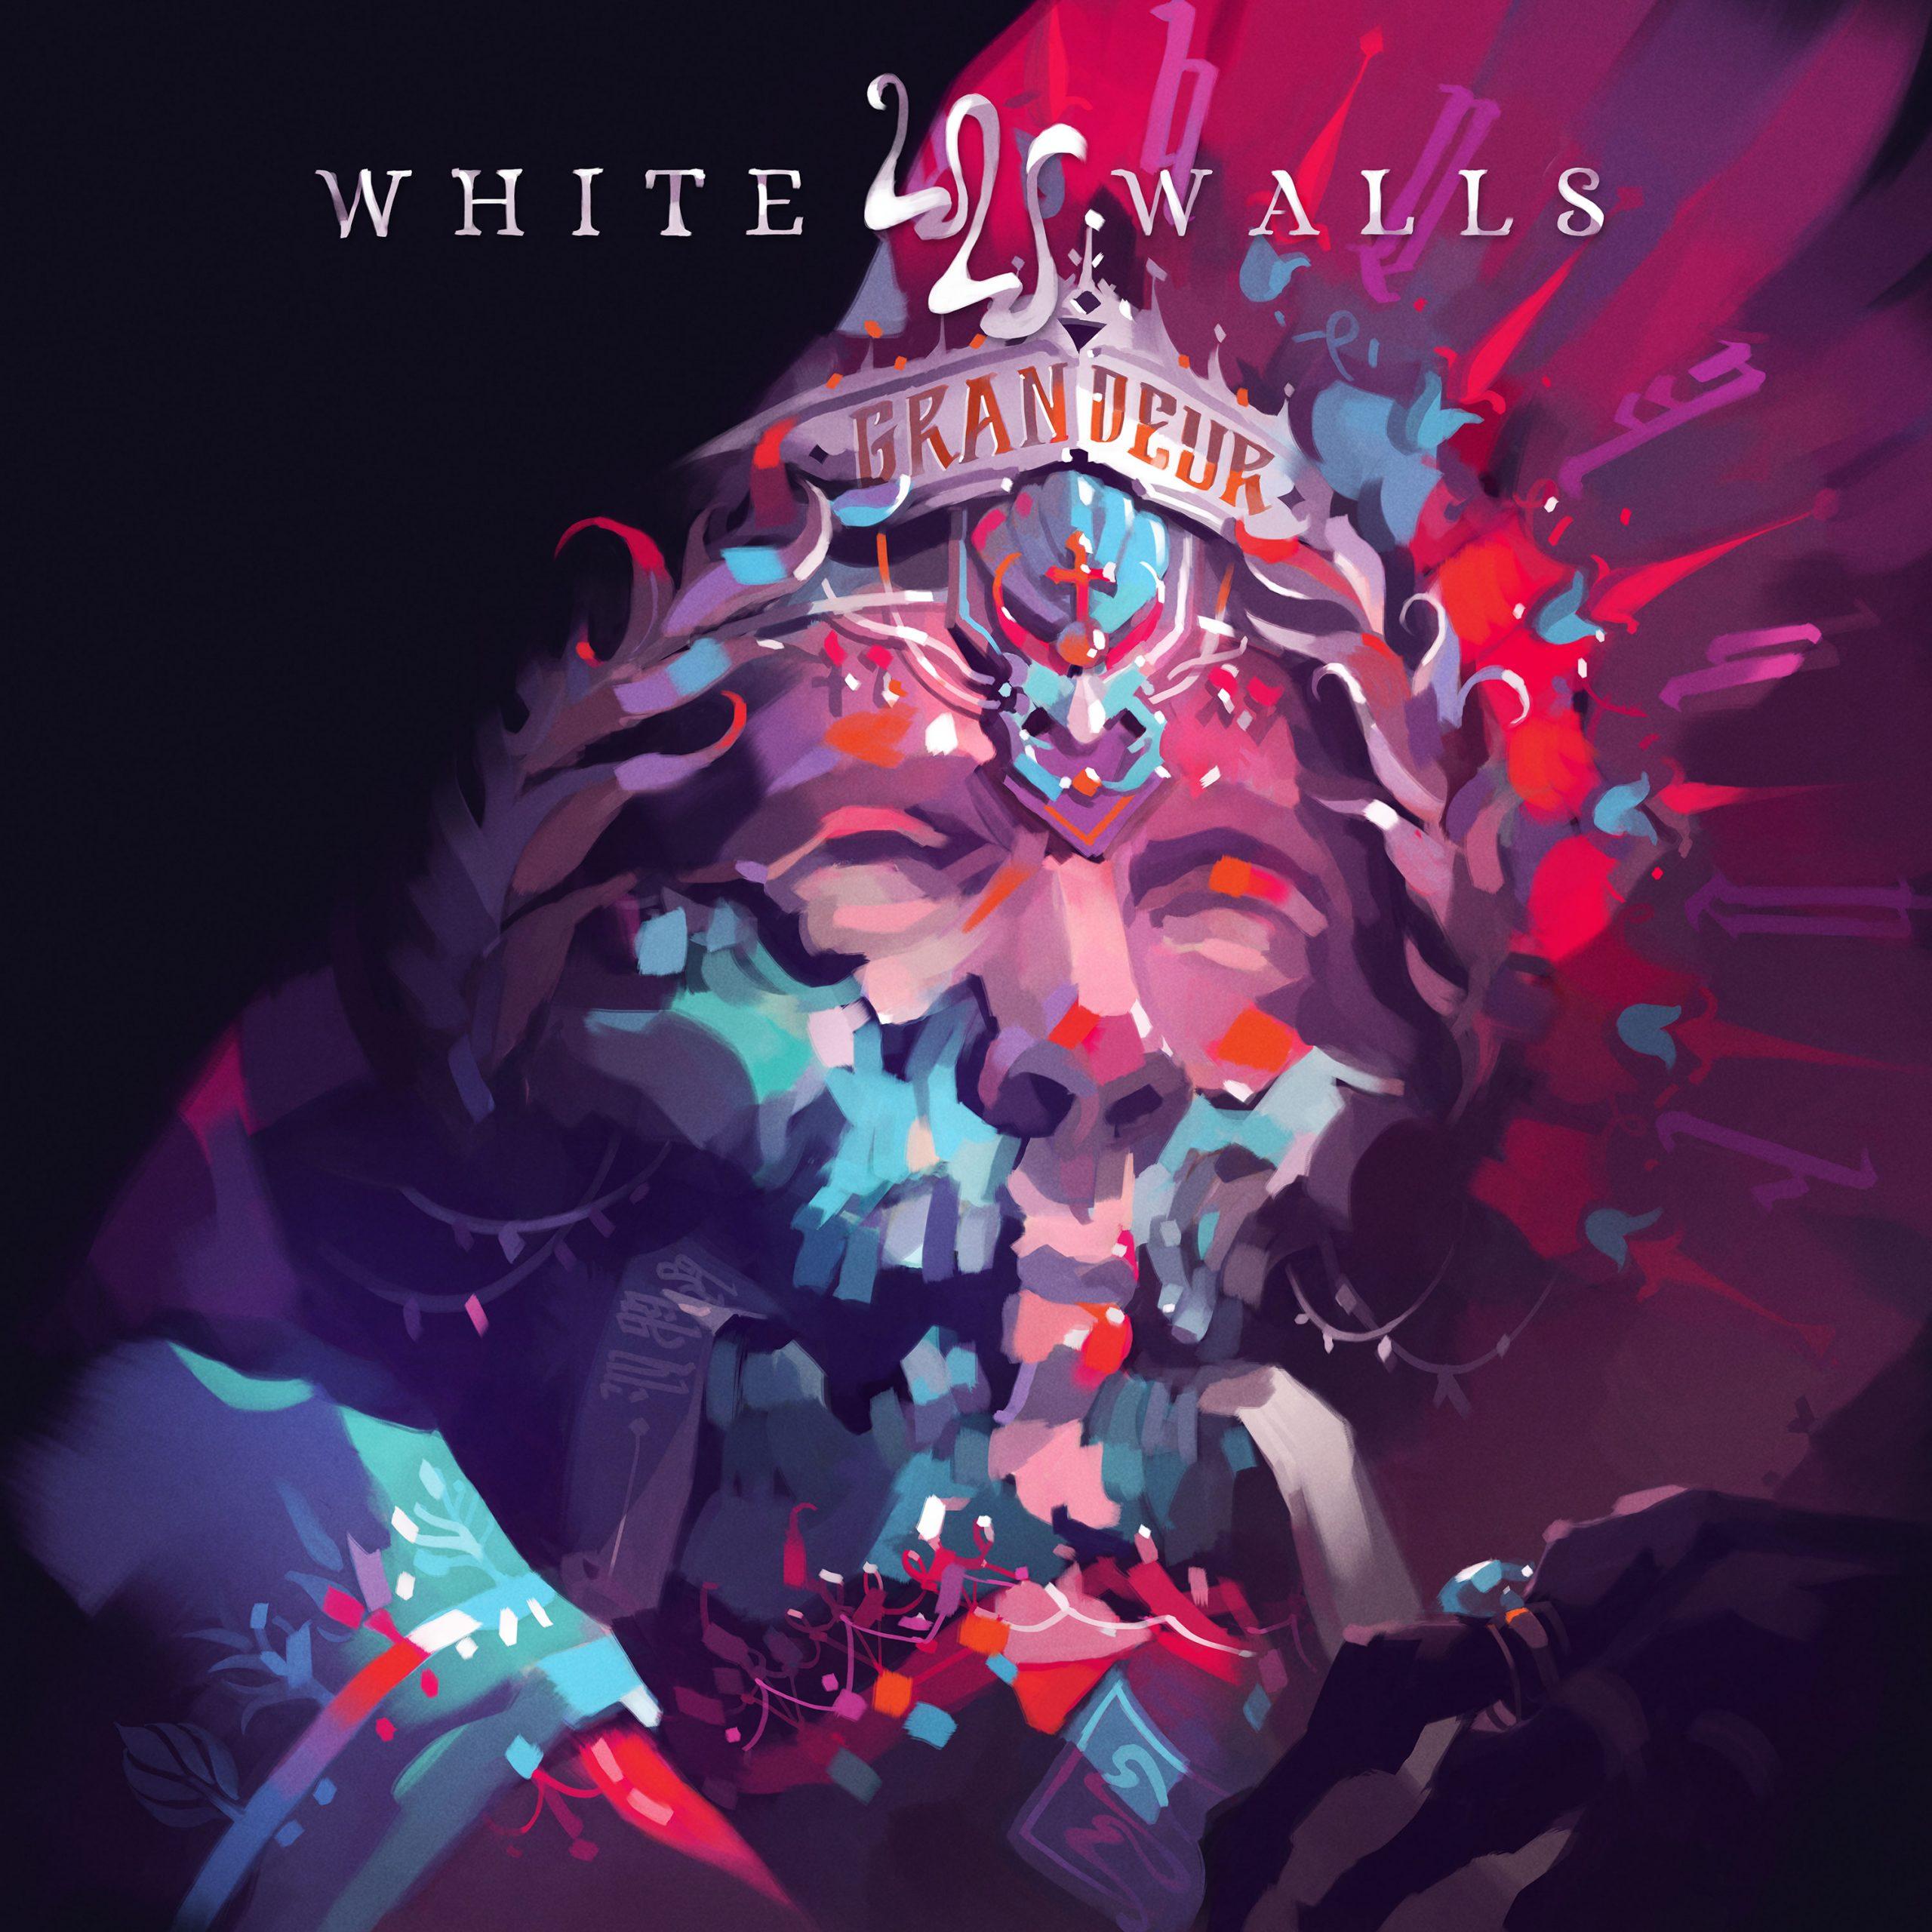 Grandeur   - Album by White Walls